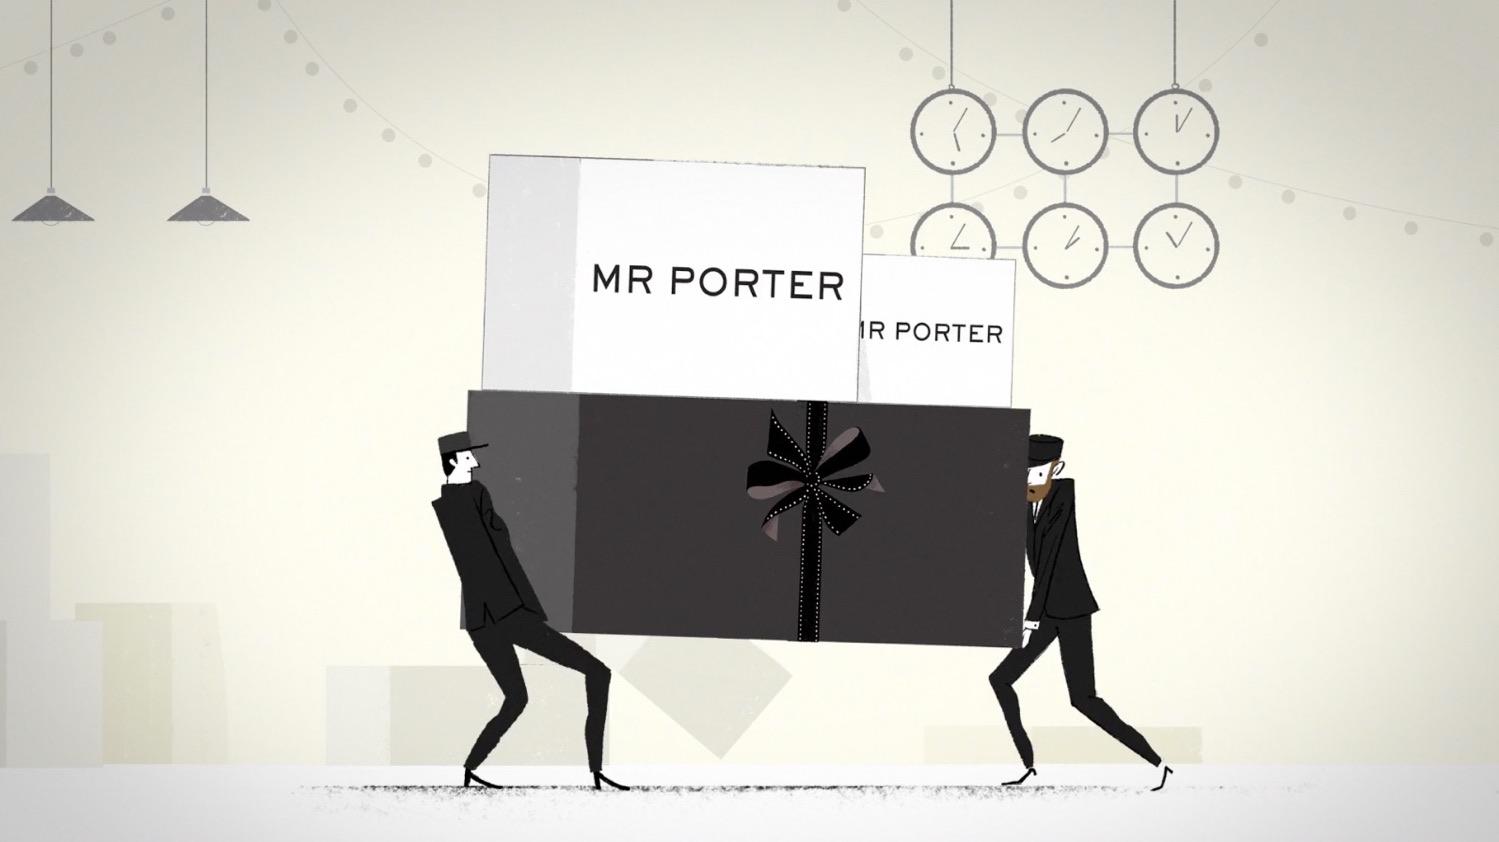 du-mr-porter-xmas-all-wrapped-up-4.jpg